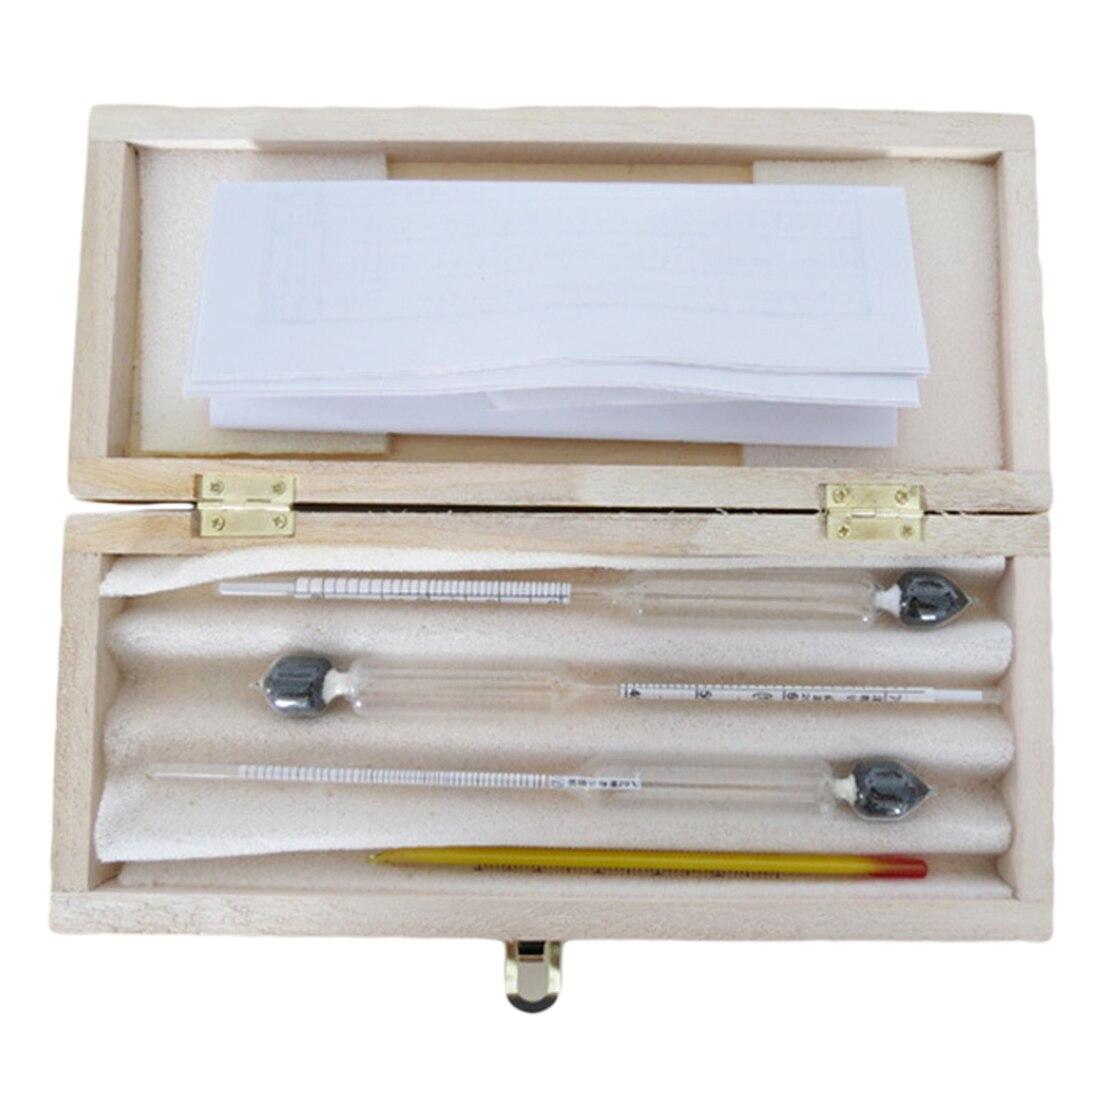 Hot 3 teile/satz Alcoholmeter Alkohol Meter wein Konzentrationsmesser Alkohol Instrument Hydrometer Tester